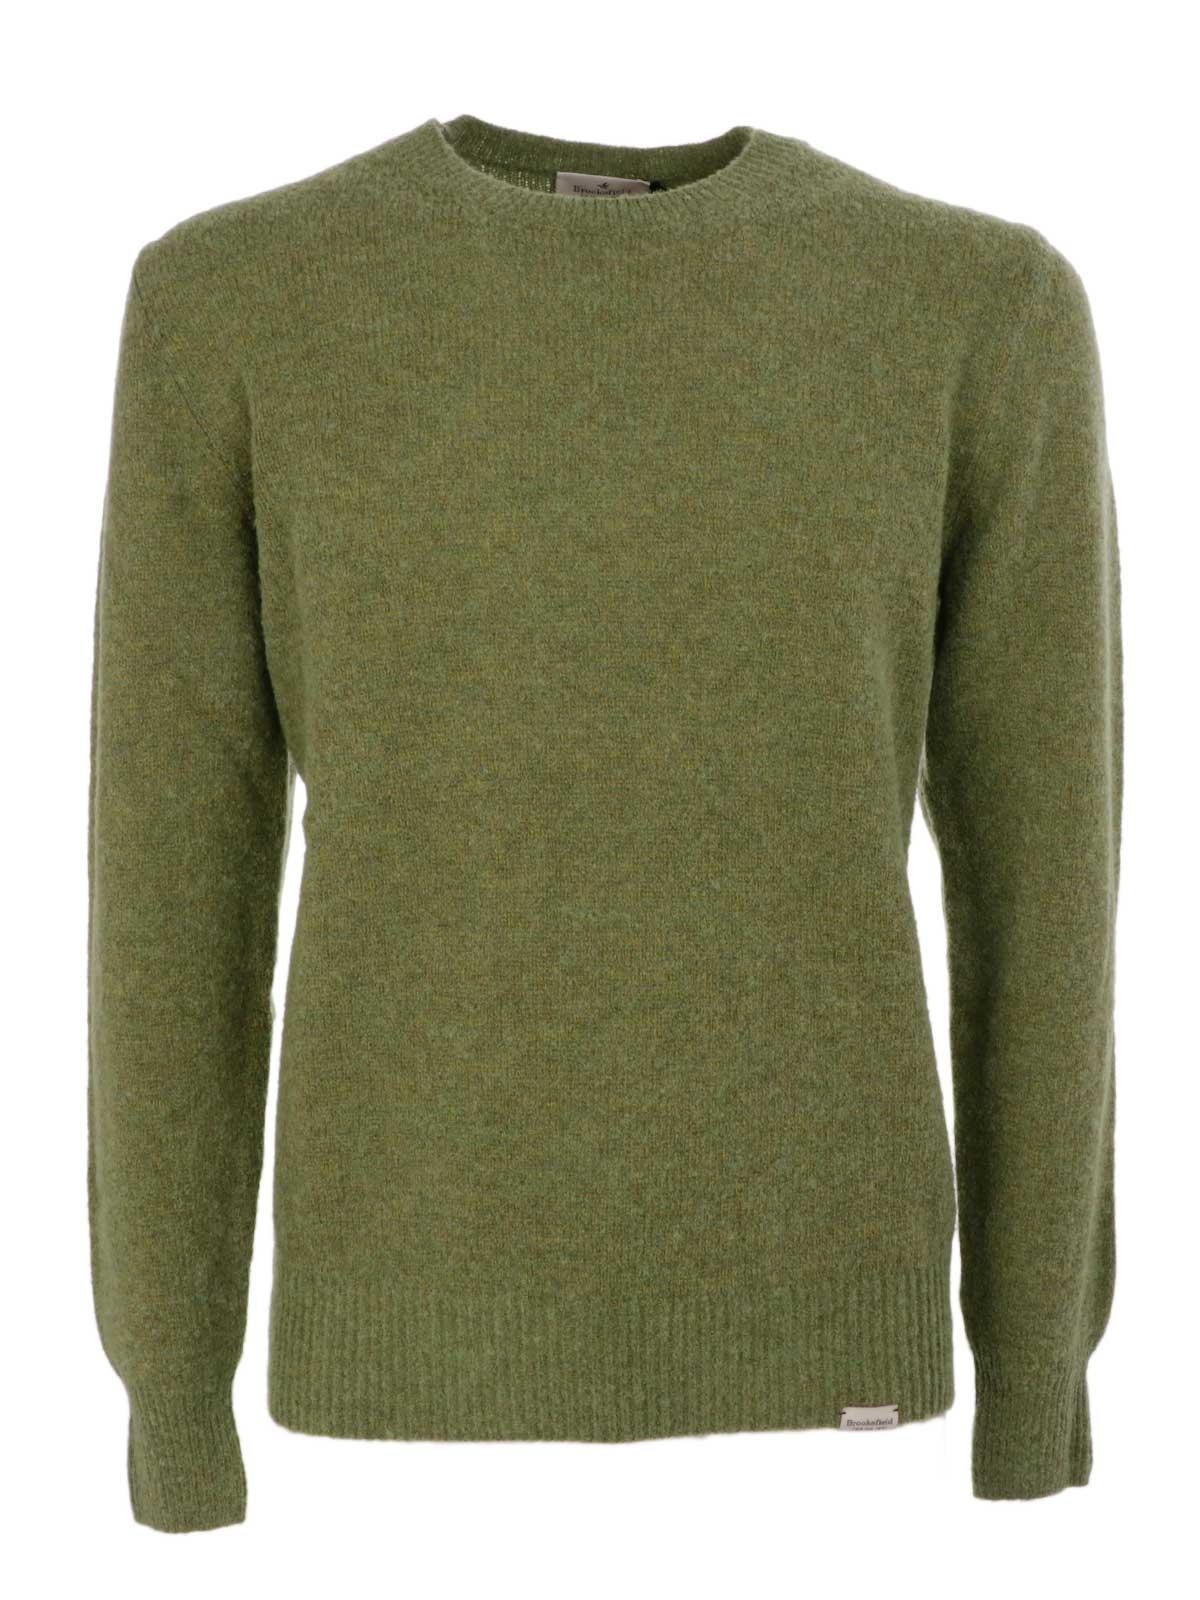 Picture of BROOKSFIELD | Men's Wool Sweater